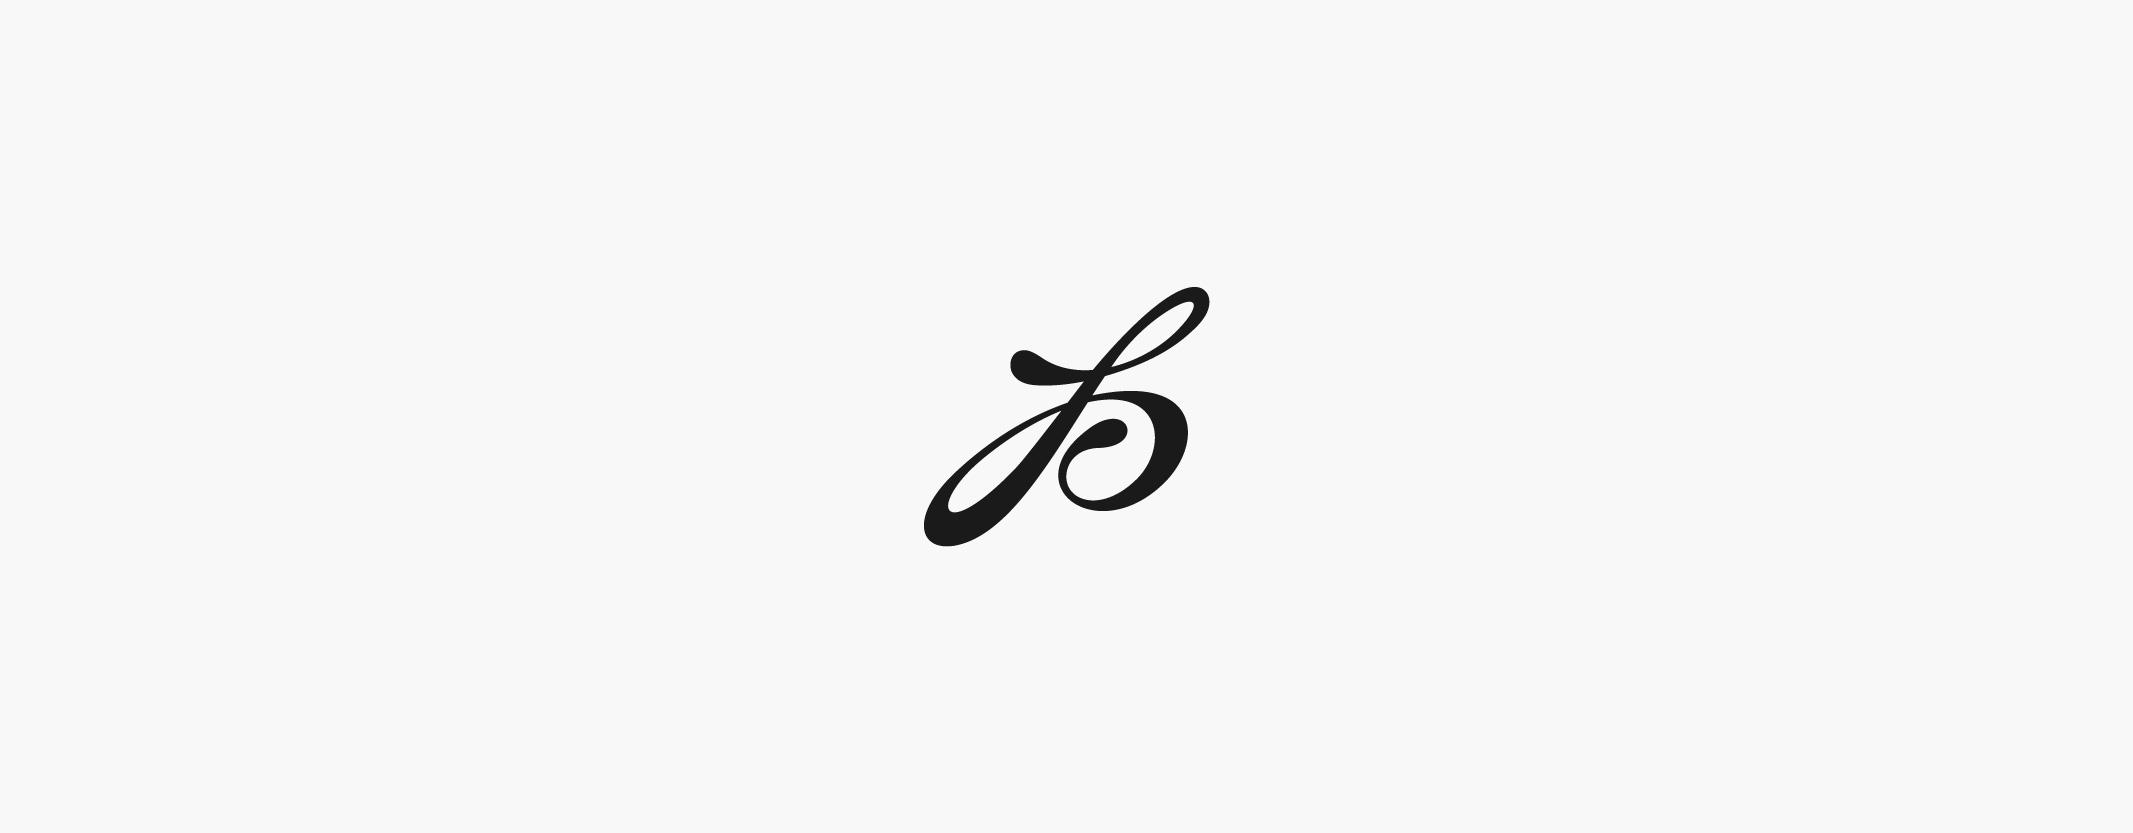 14_logos_Jo